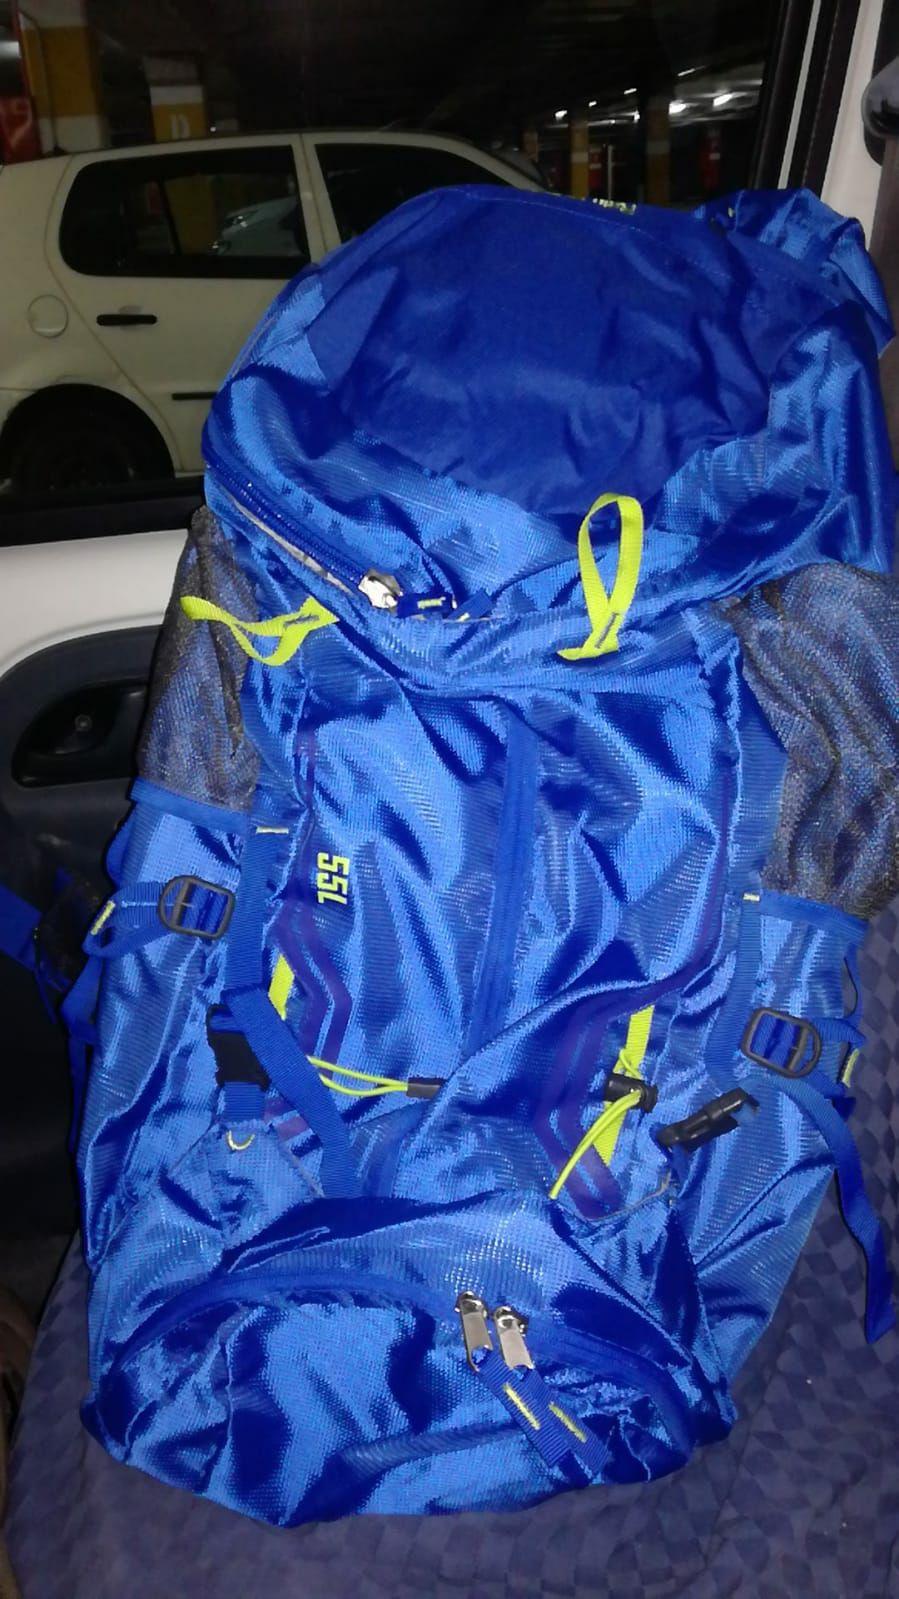 Liquidación de mochilas de montaña en Carrefour (Cocentaina)